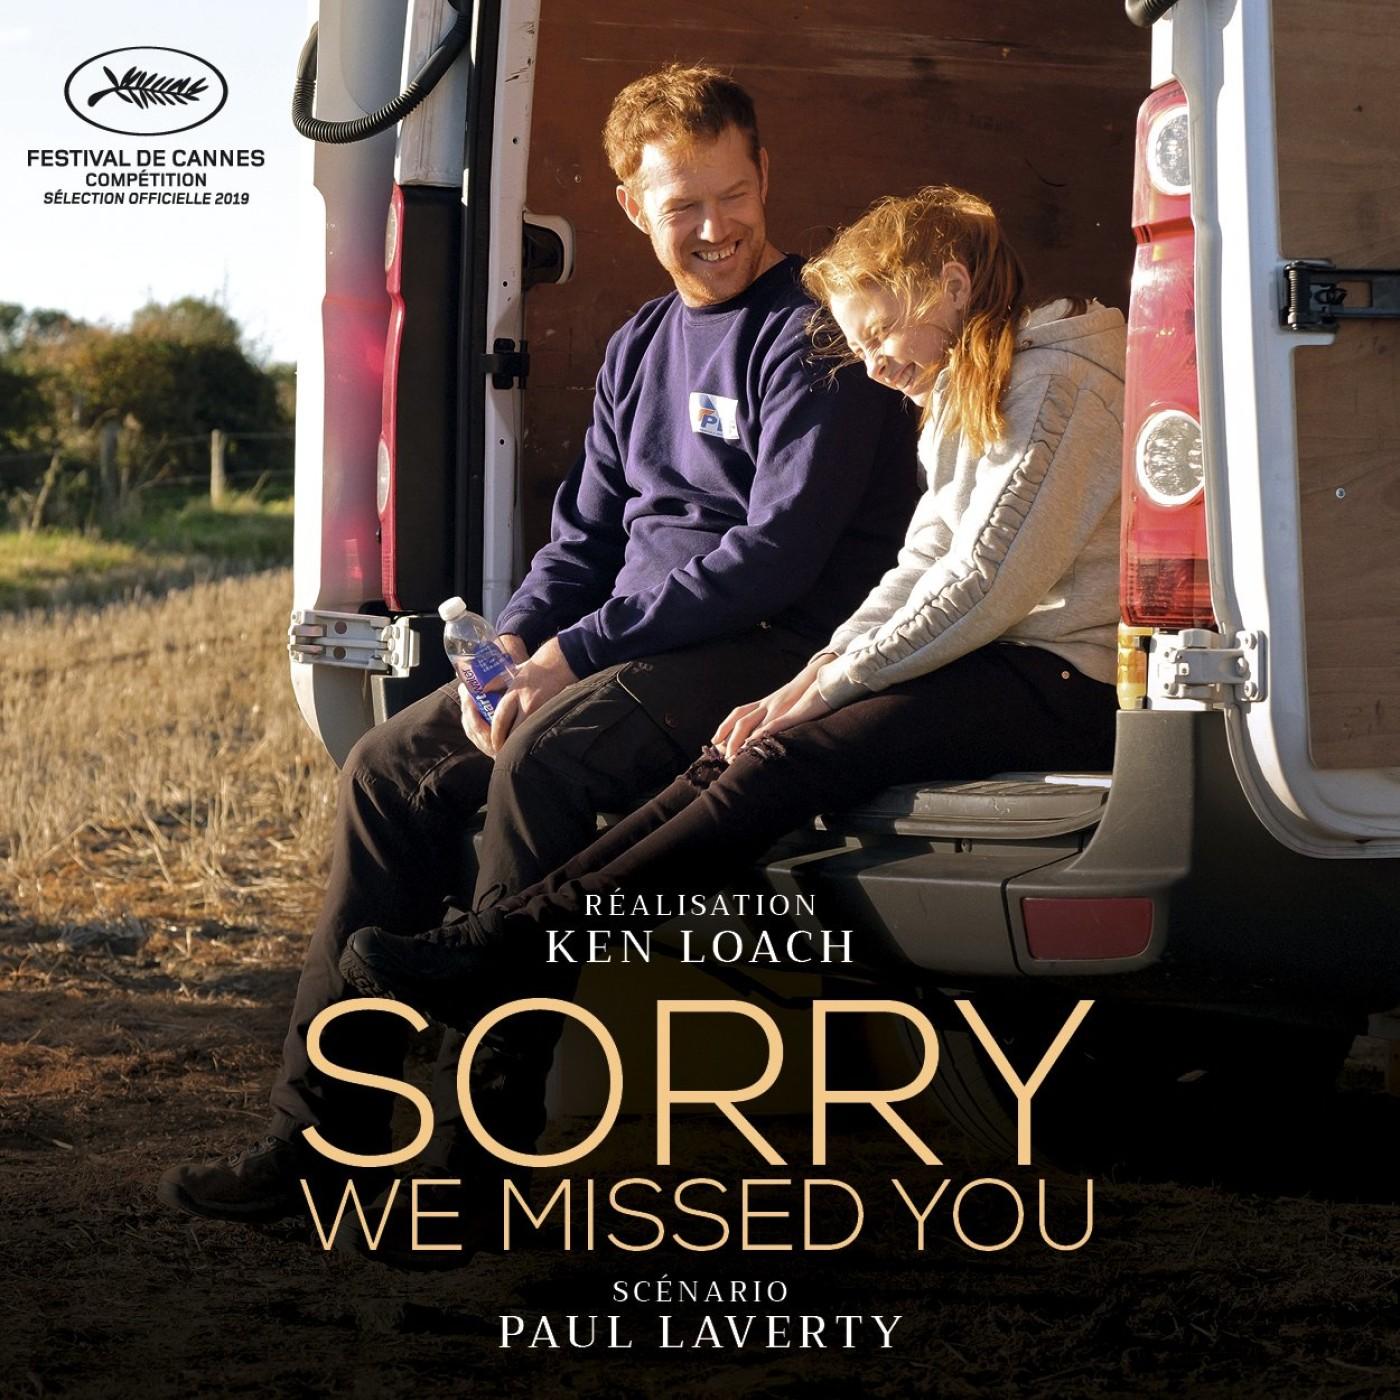 Critique du Film SORRY WE MISSED YOU | Ken Loach